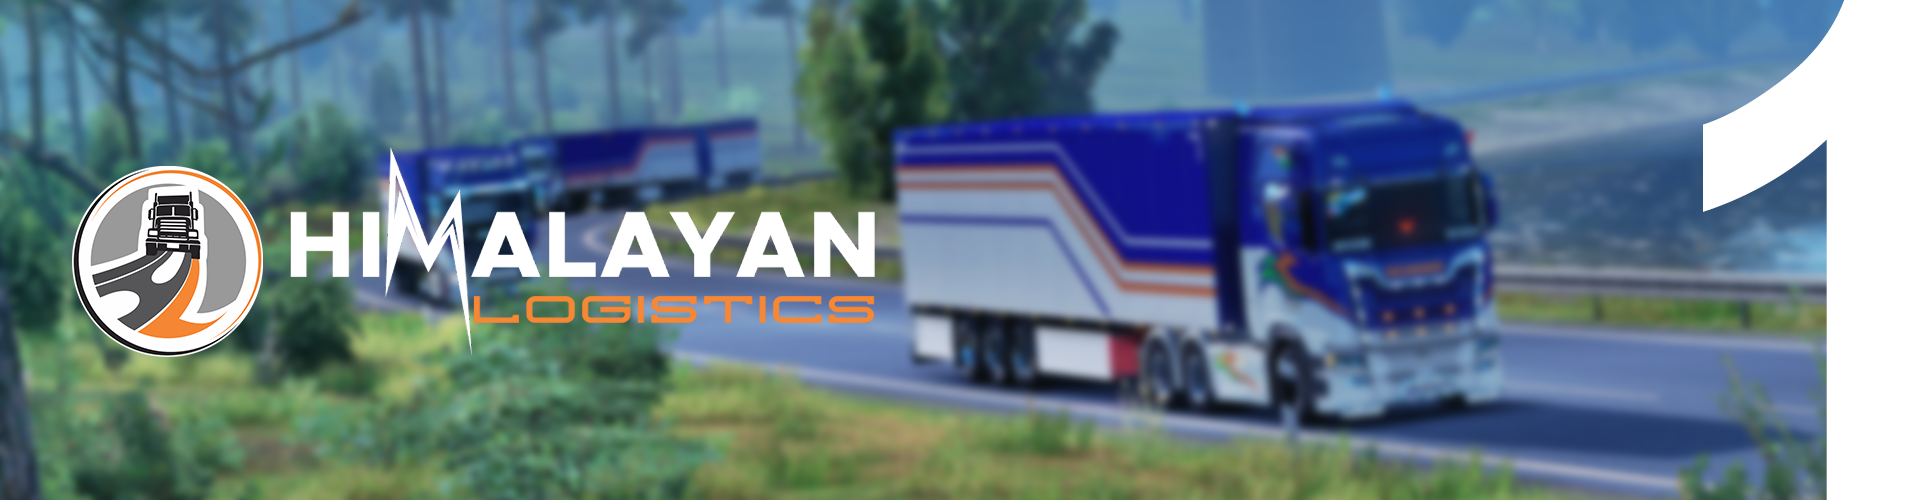 Himalayan Logistics One Year Anniversary